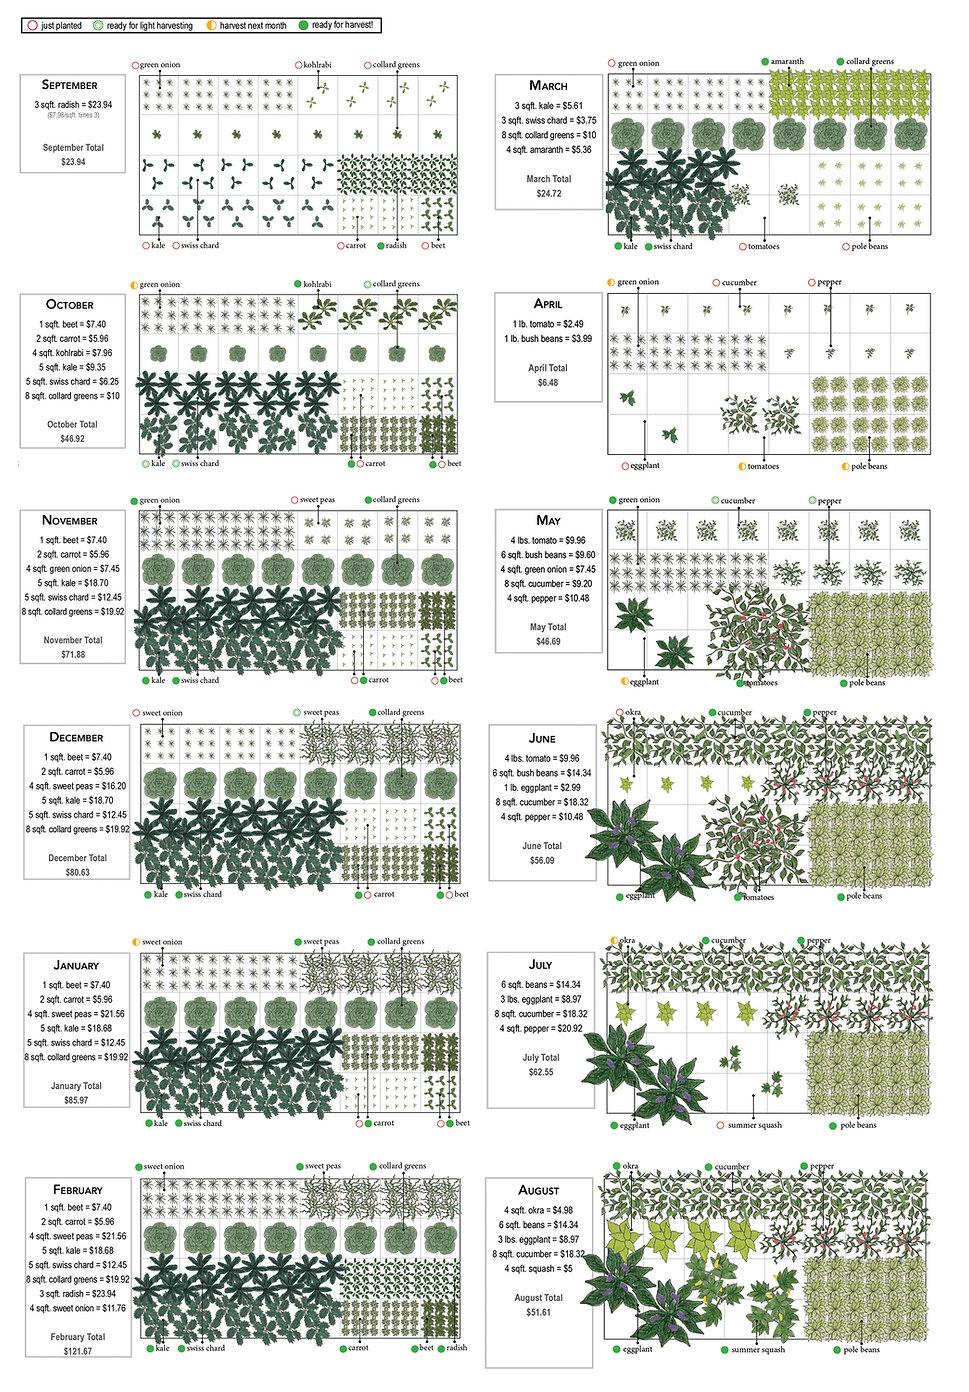 WI garden beds.jpg